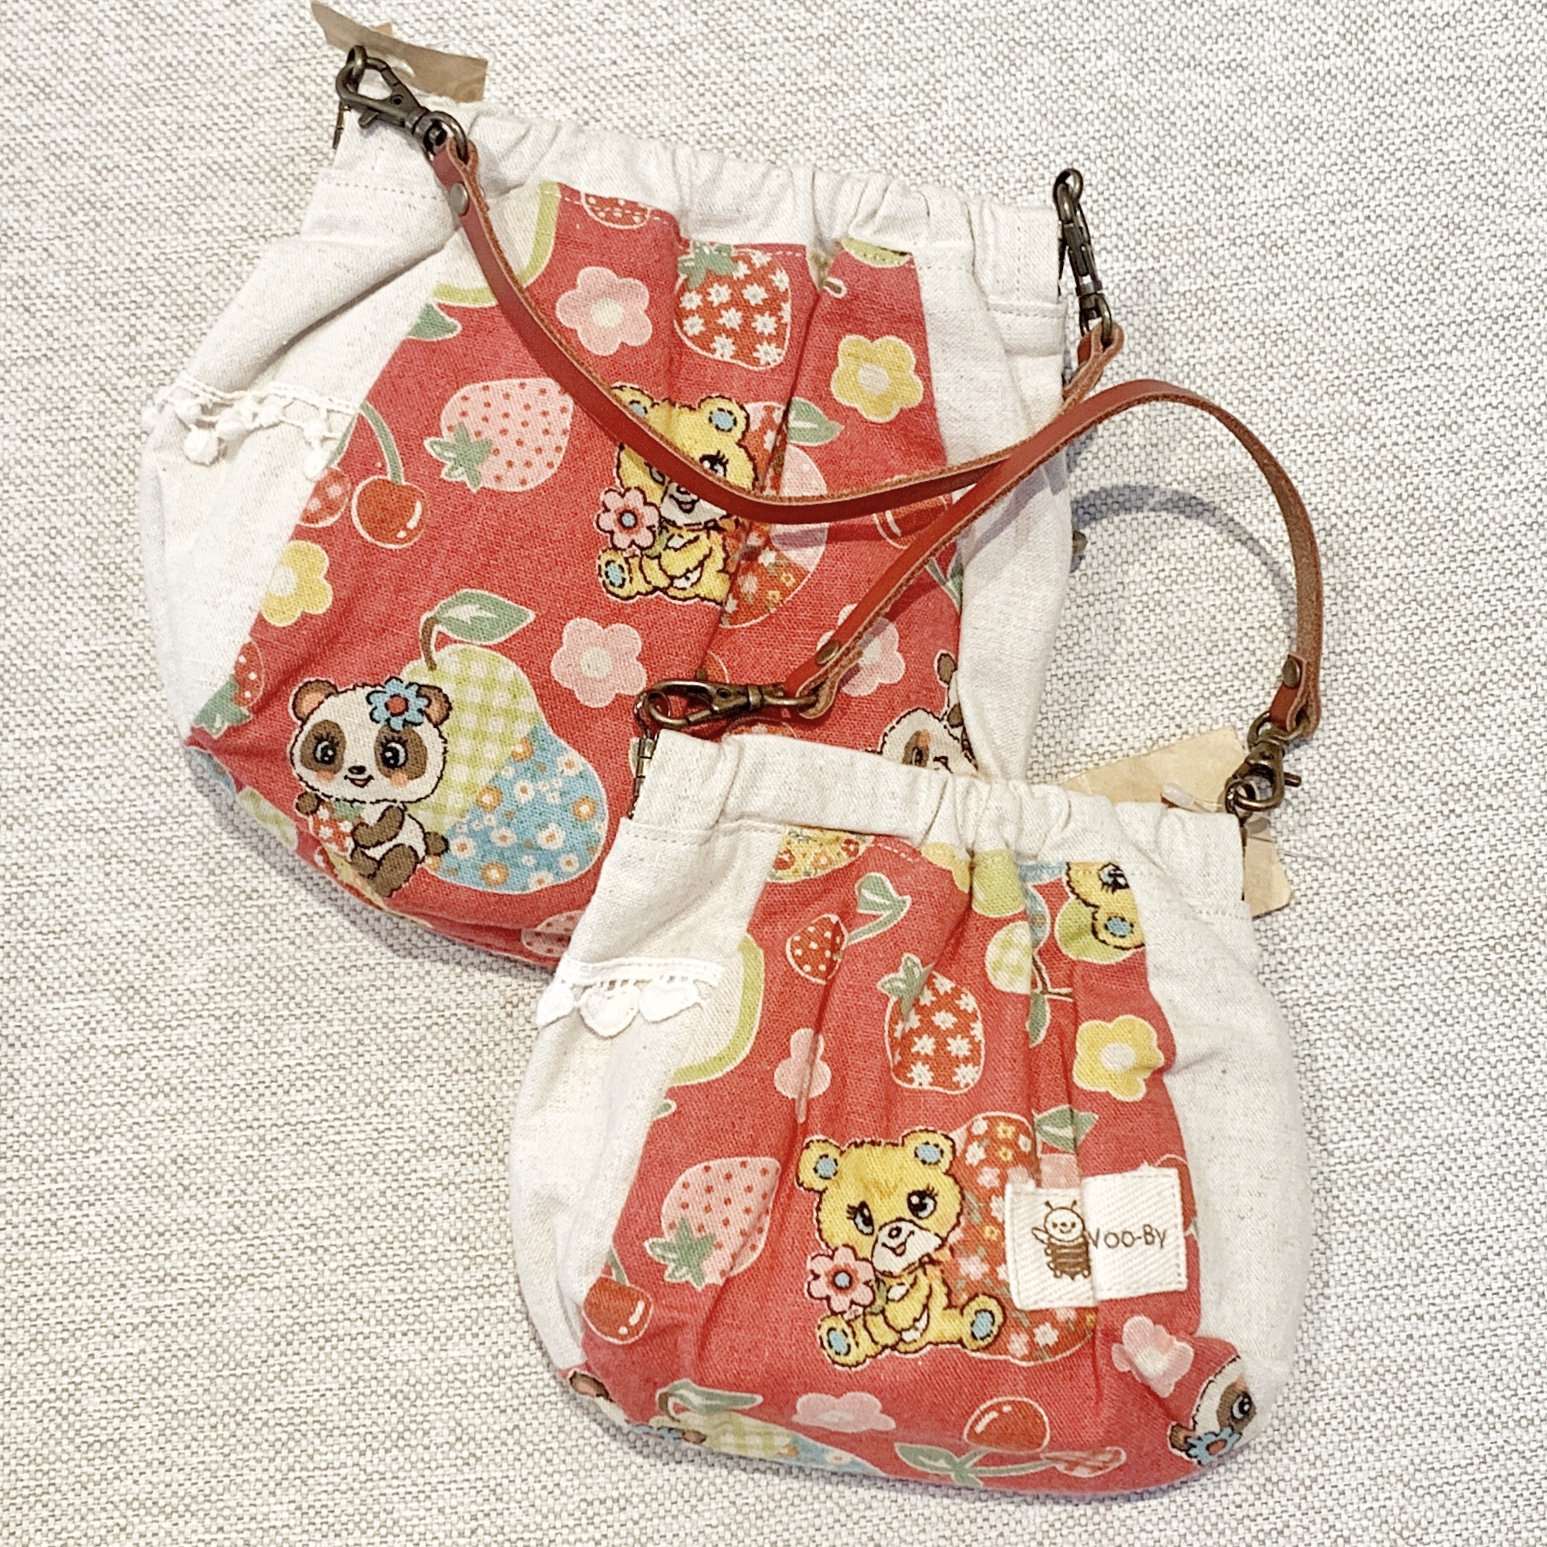 woo-by-minibag